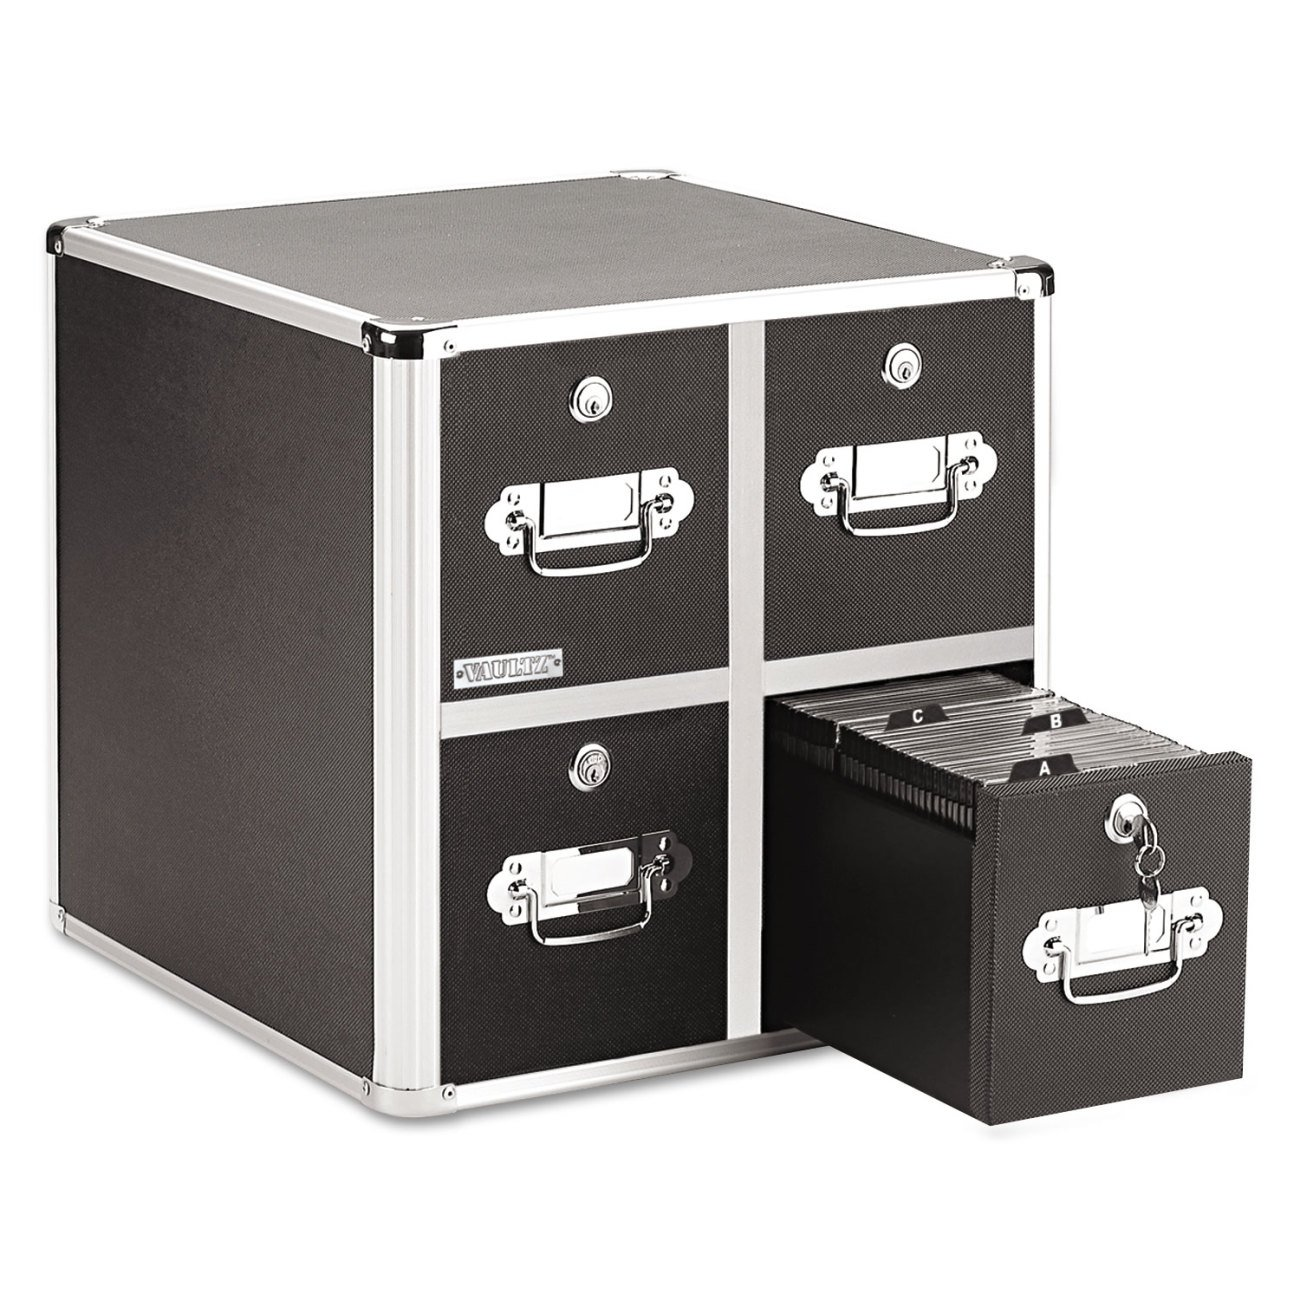 Vaultz Locking CD File Cabinet, 4 Drawers, 15.25 x 14.00 x 14.50 Inches, Black (VZ01049)